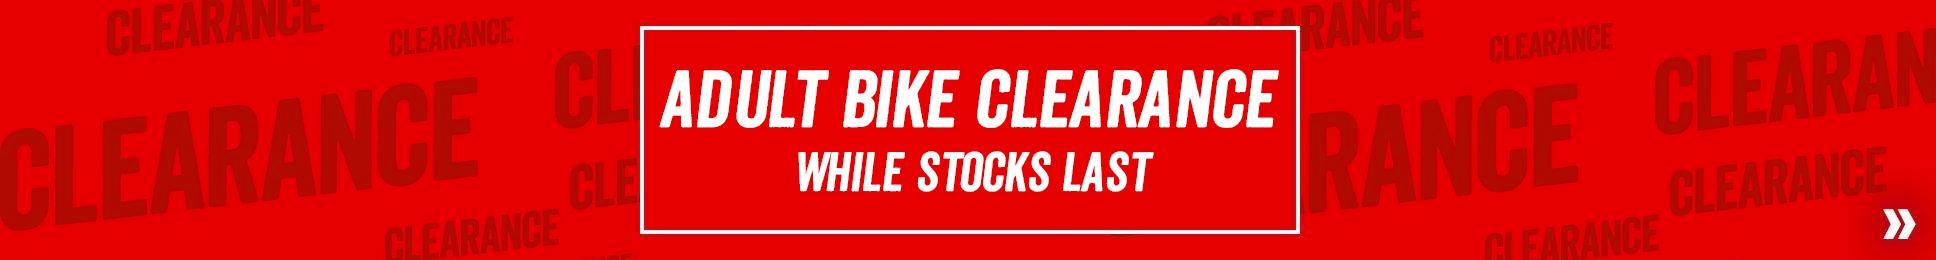 Clearance Adult Bikes